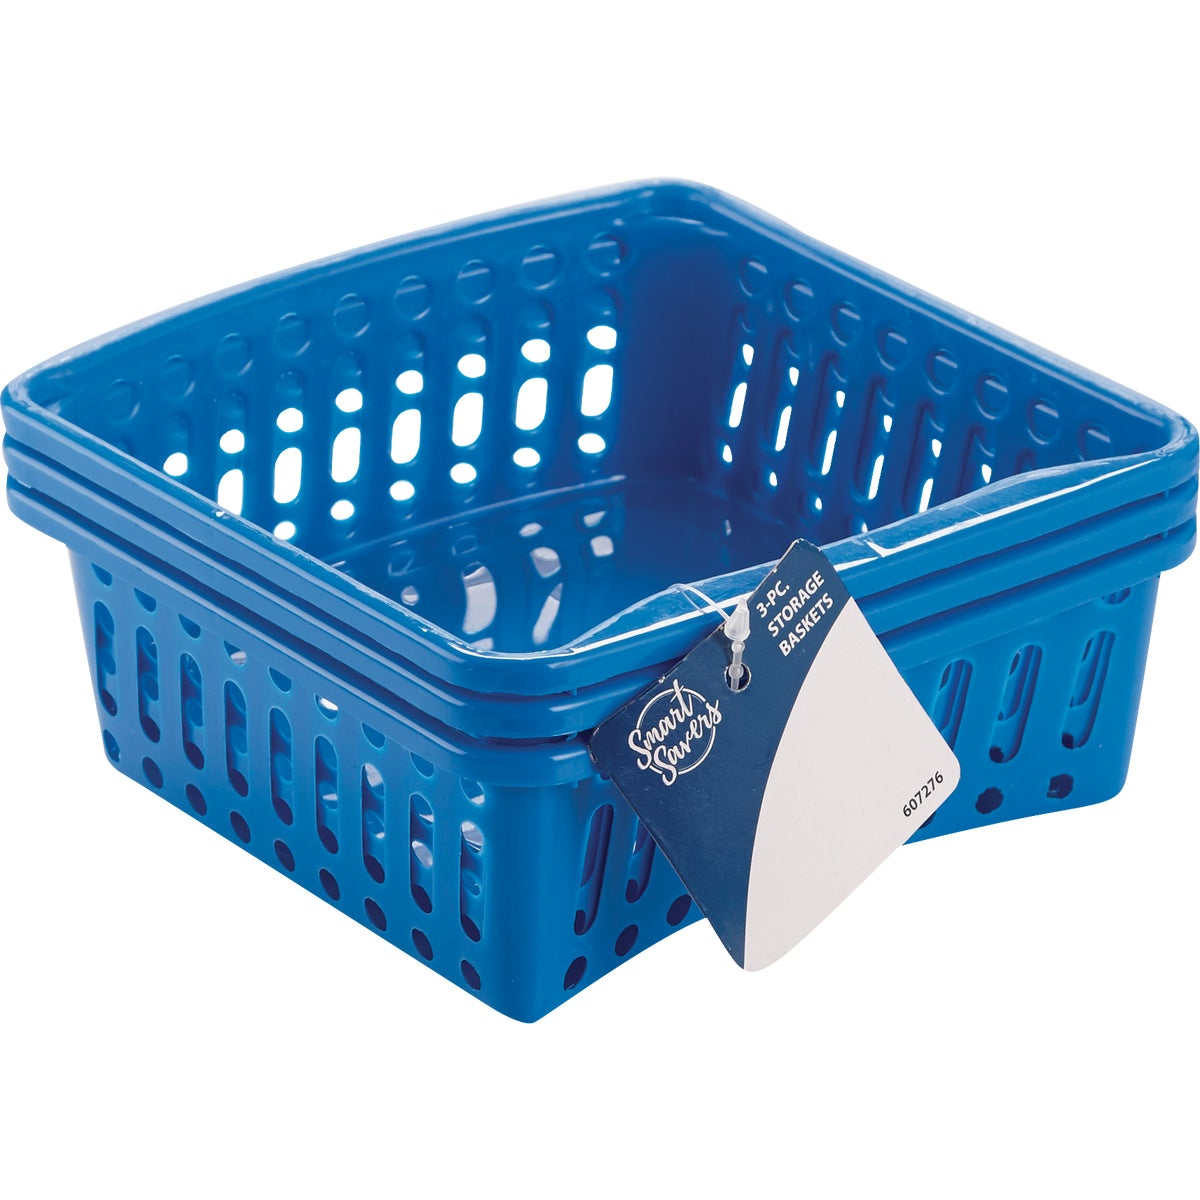 3Pc Storage Baskets